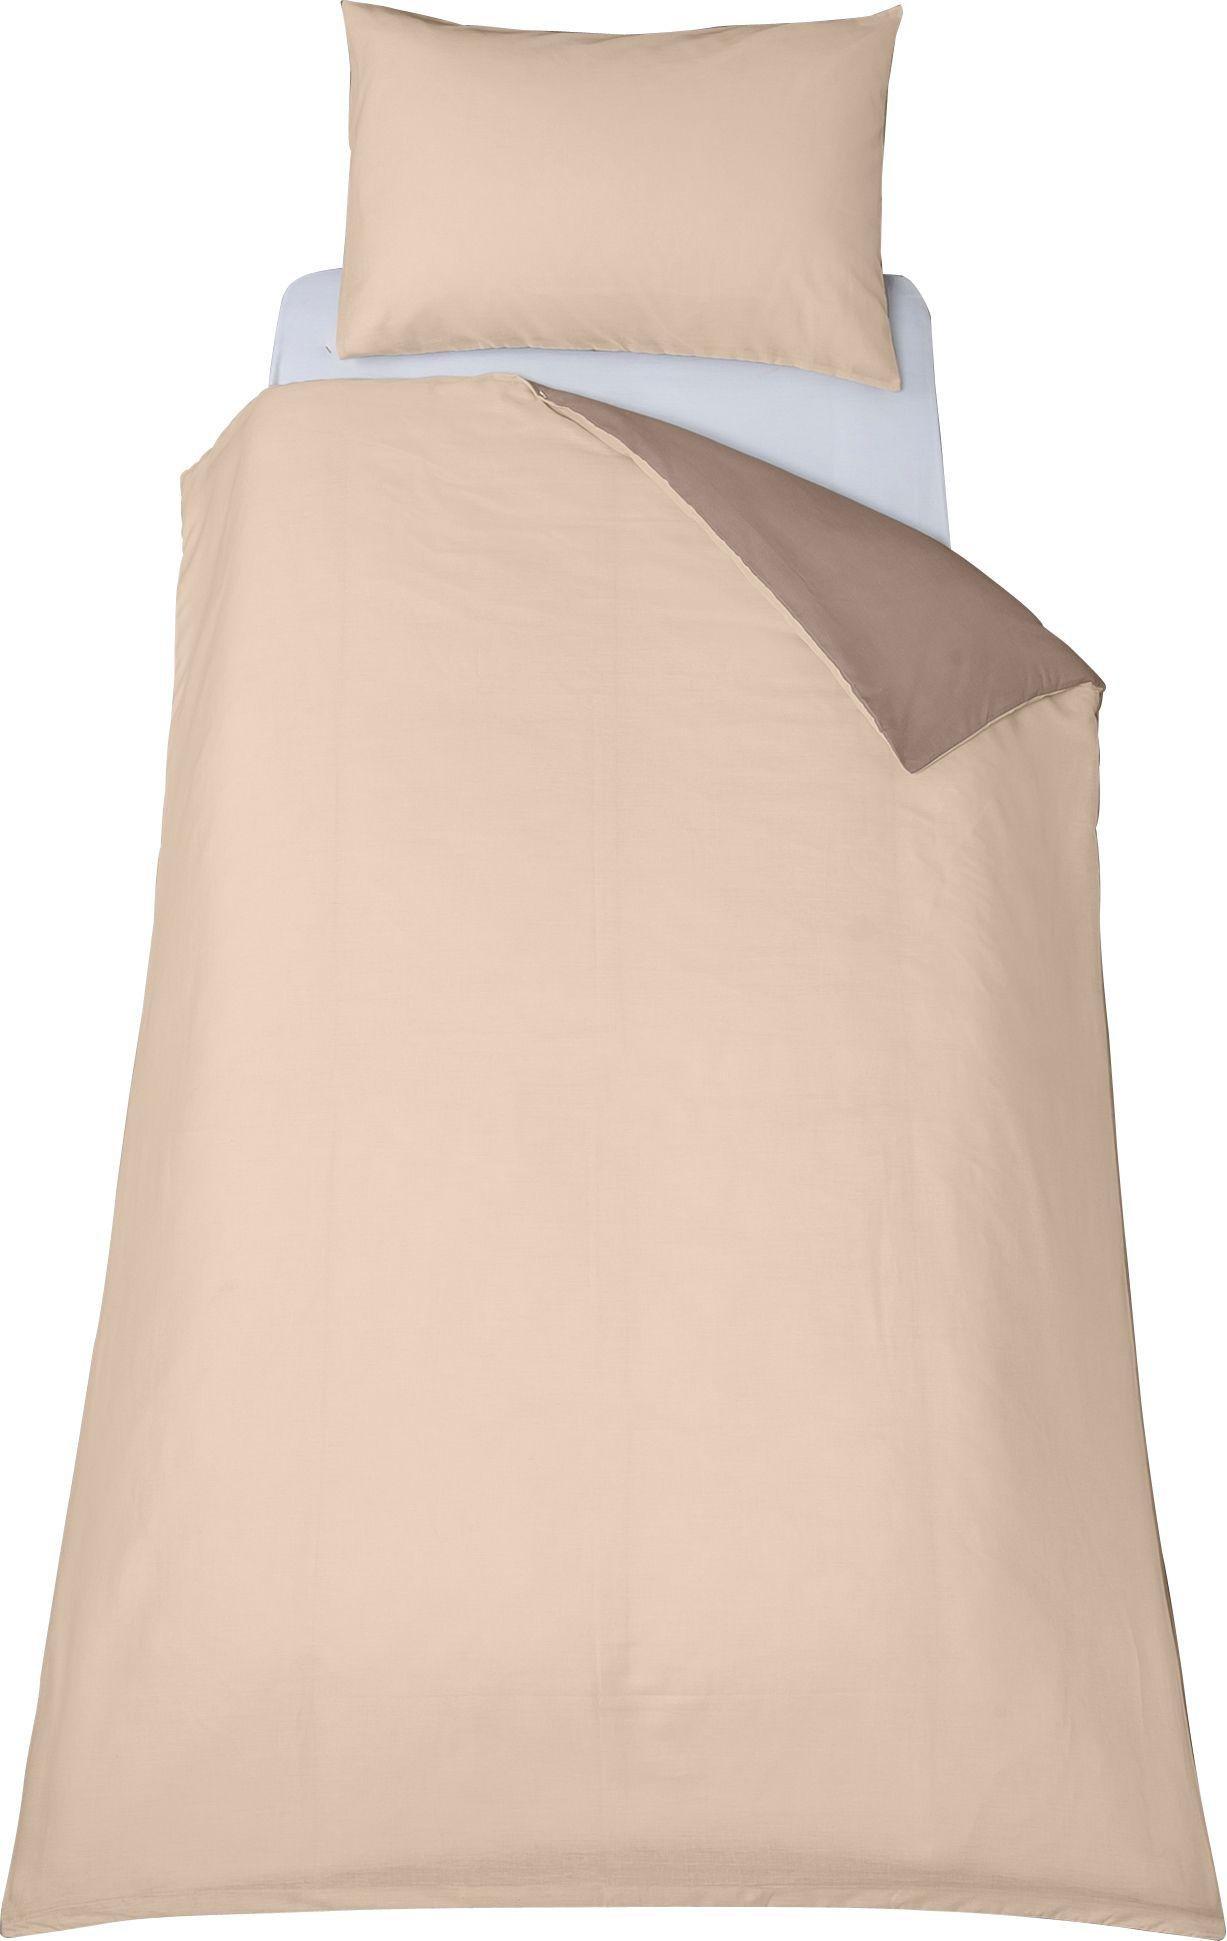 colourmatch  cafe mocha/cotton cream  bedding set  single